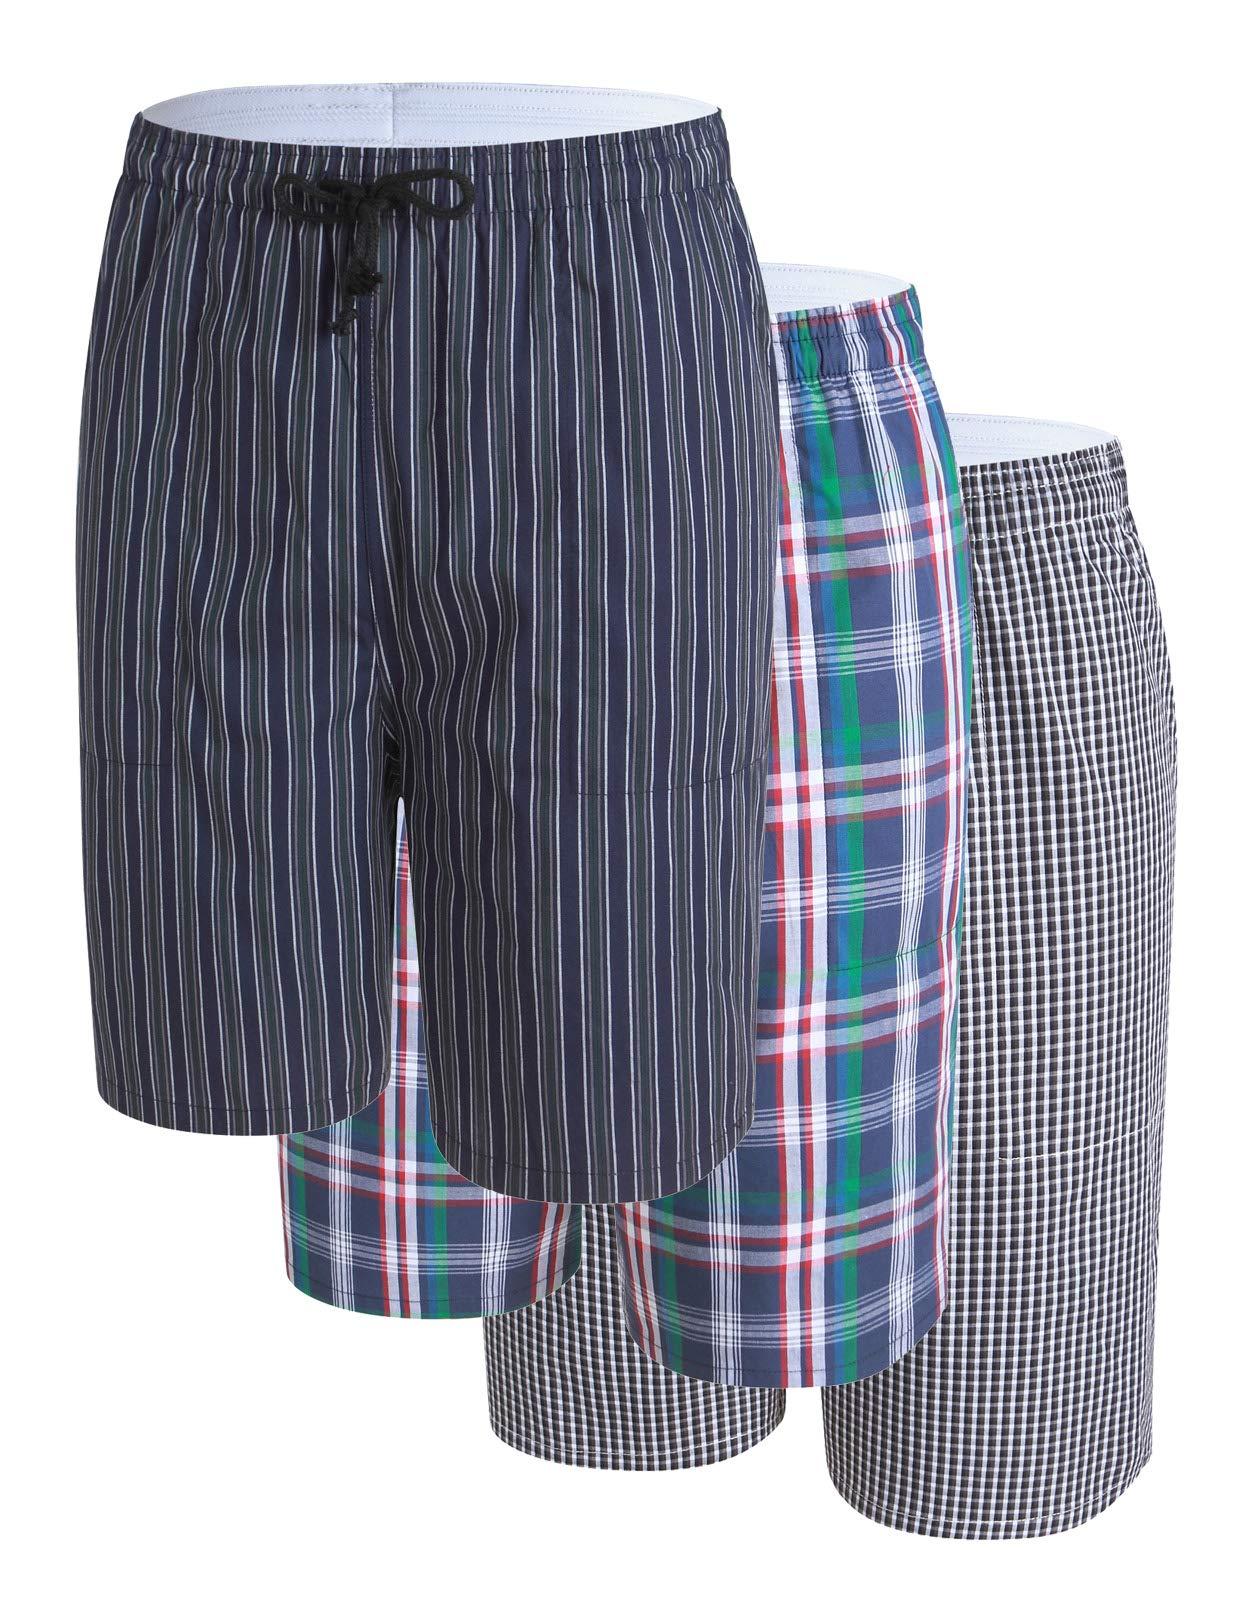 PAUL JONES Men's Summer Shorts for Beach Plaid Pajama Bottoms 3 Pack